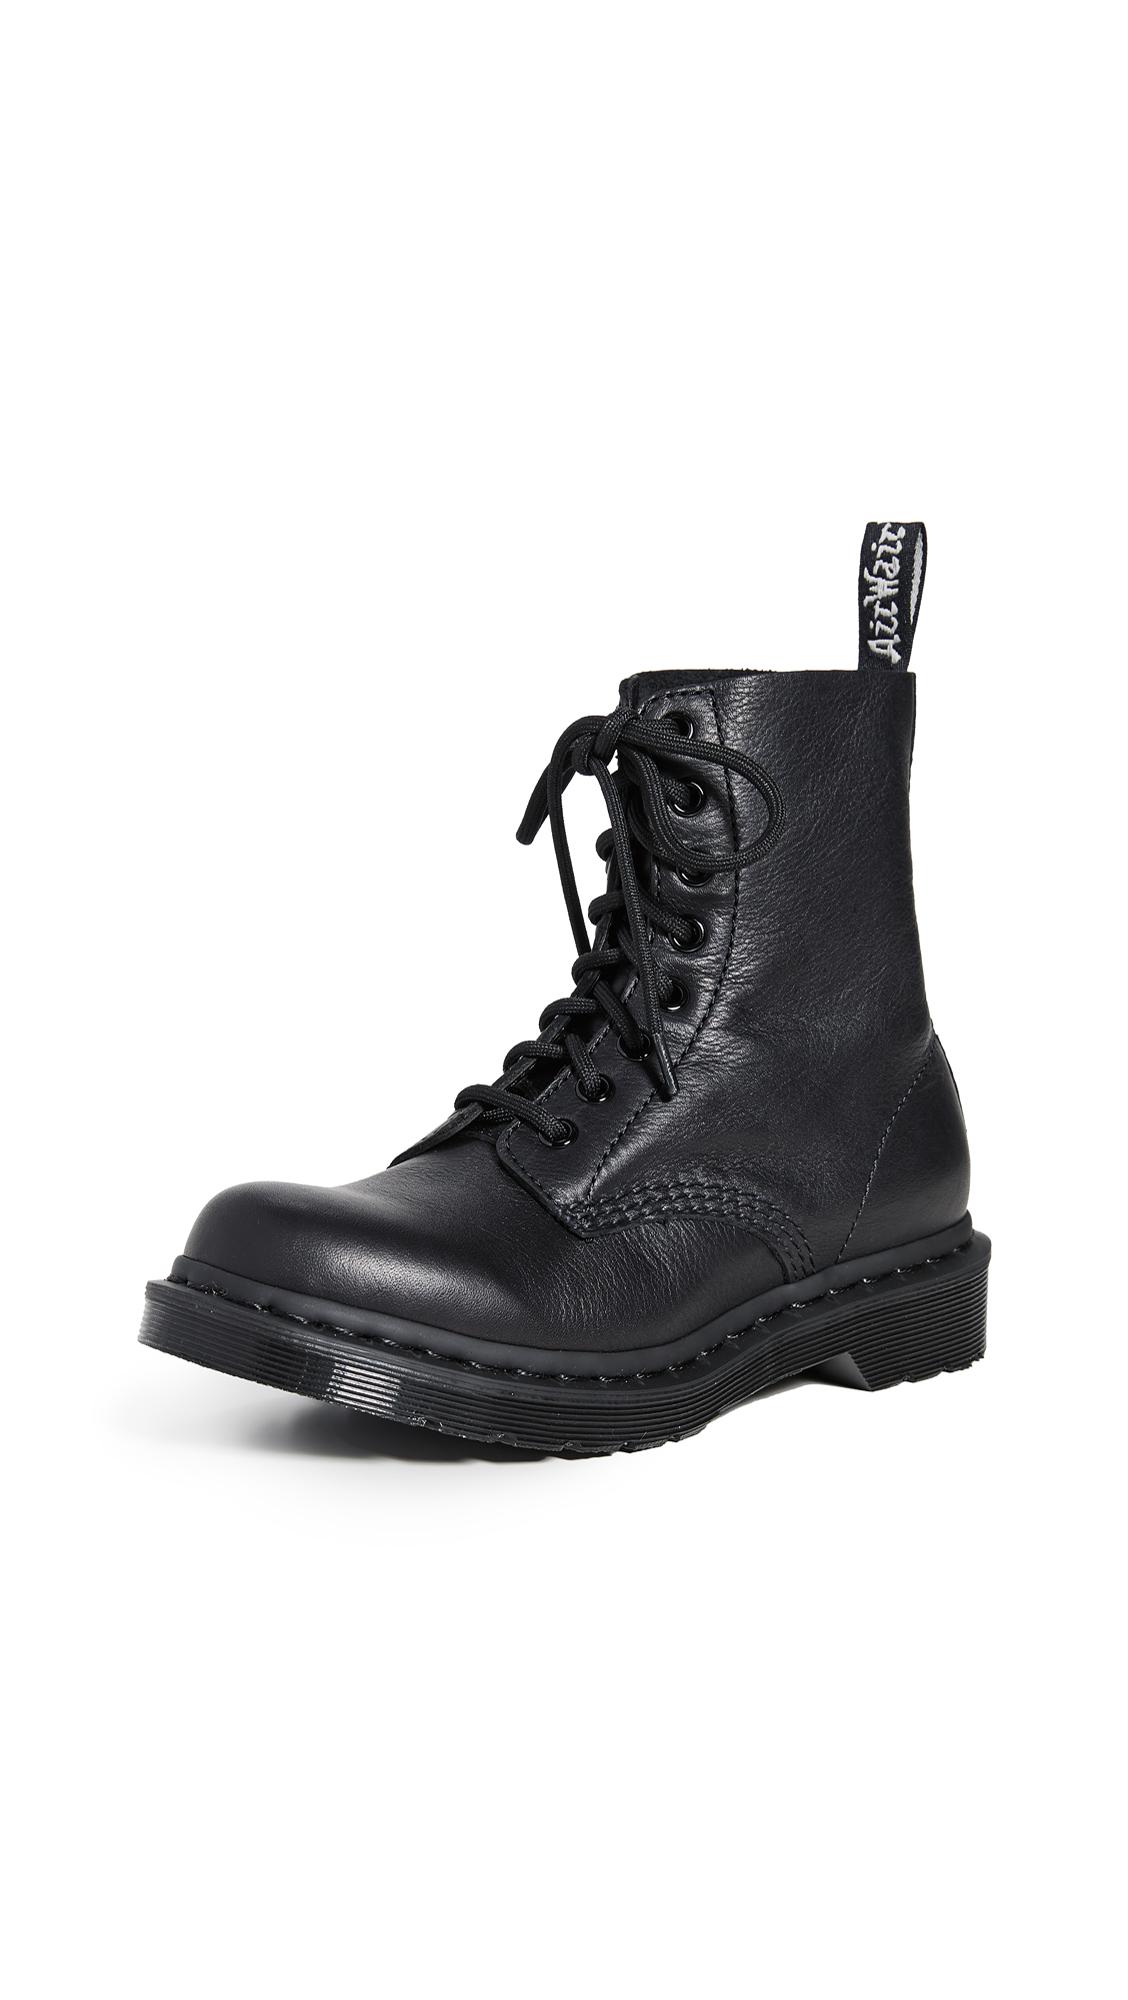 Buy Dr. Martens 1460 Pascal Mono 8 Eye Boots online, shop Dr. Martens